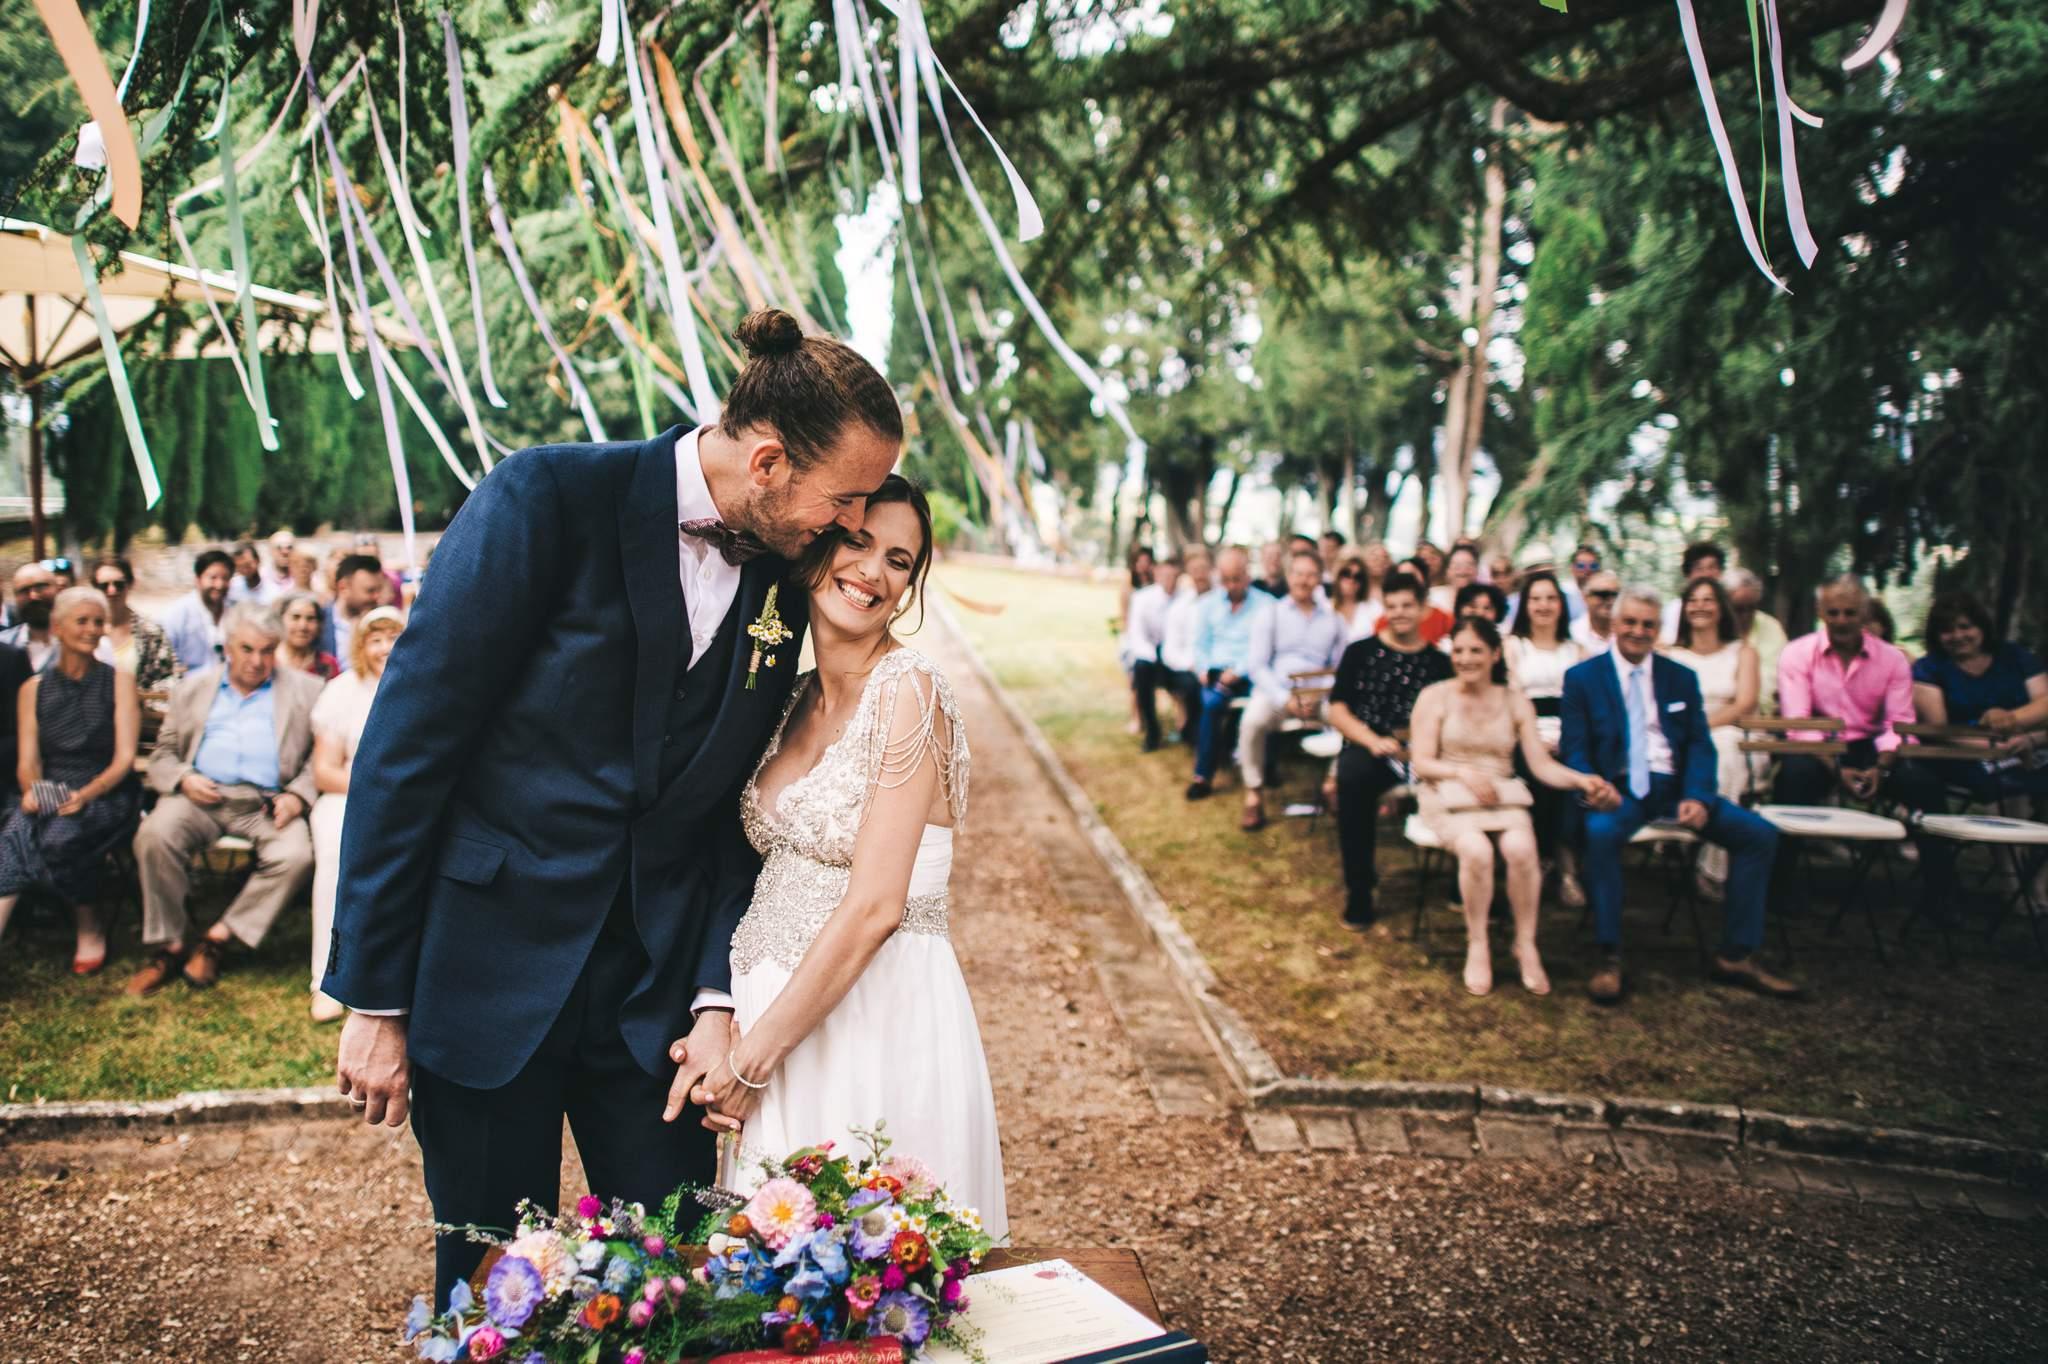 16wedding-photographer-villa-petrolo